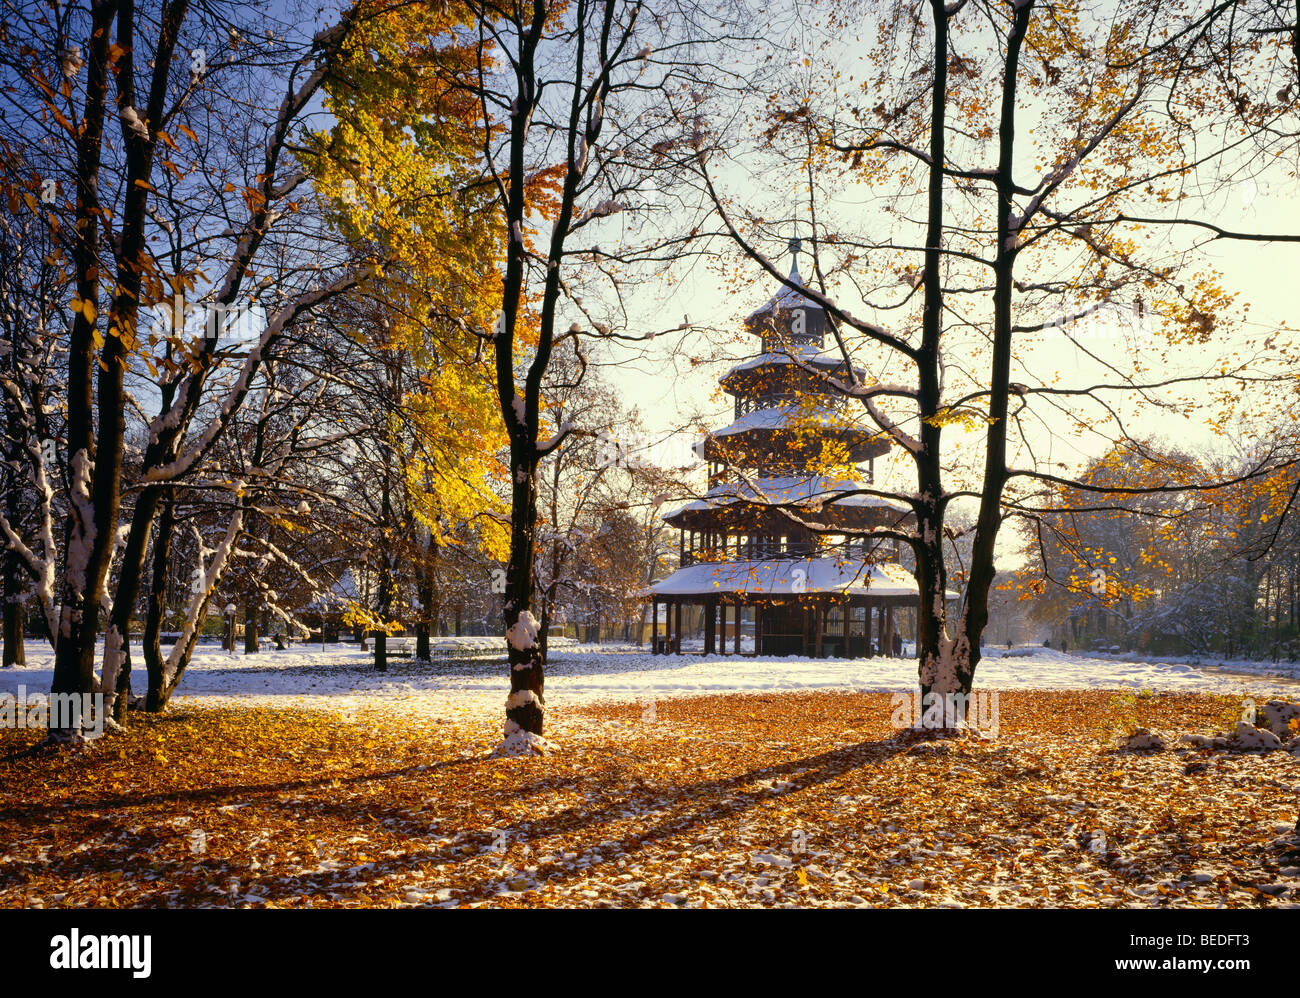 Chinese tower, English Gardens, Munich, Bavaria, Germany, Europe - Stock Image